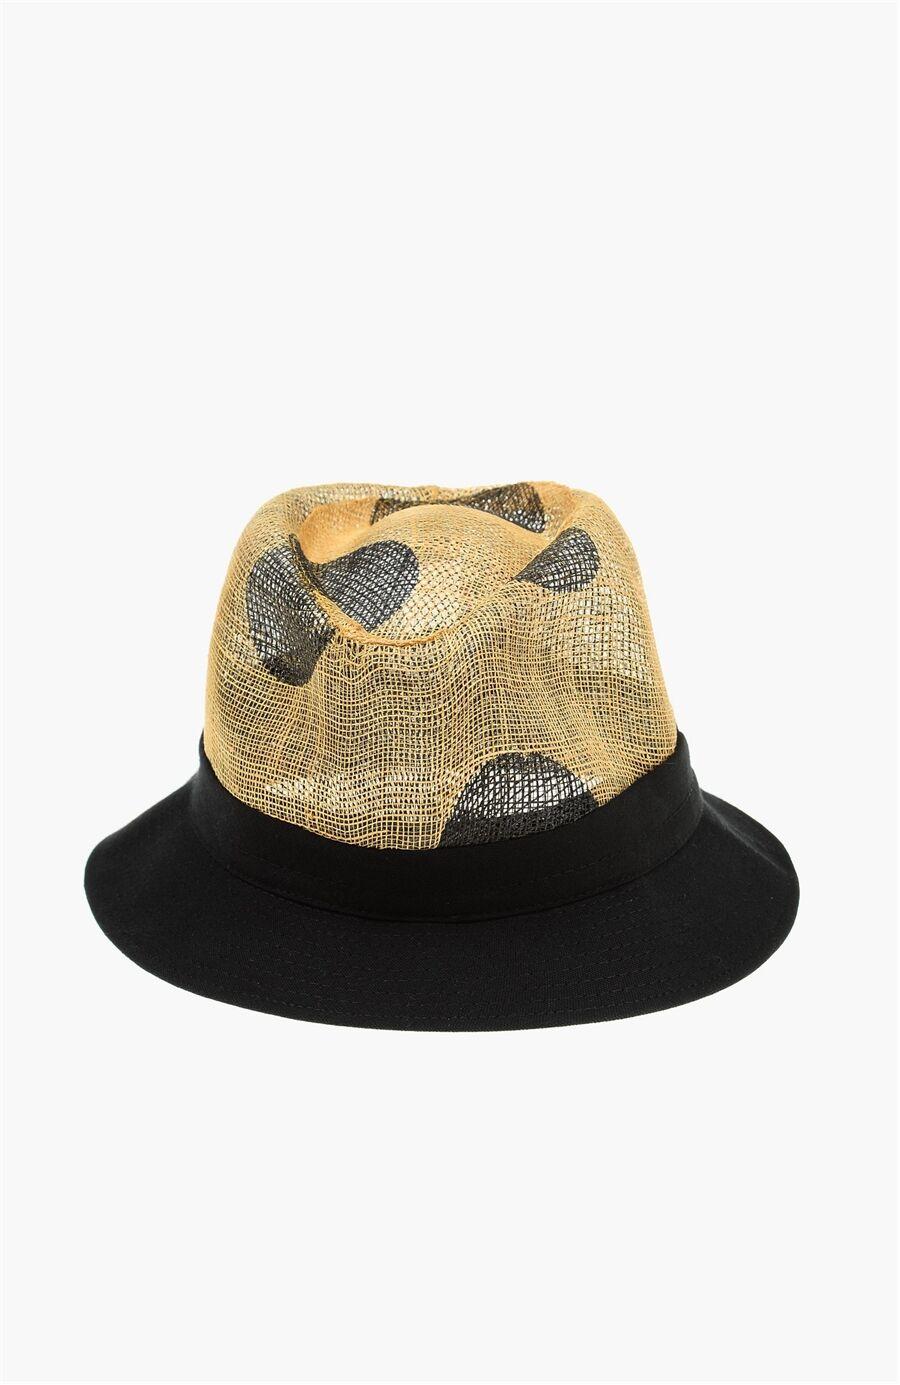 Dıvarese Siyah Bej Şapka – 249.0 TL